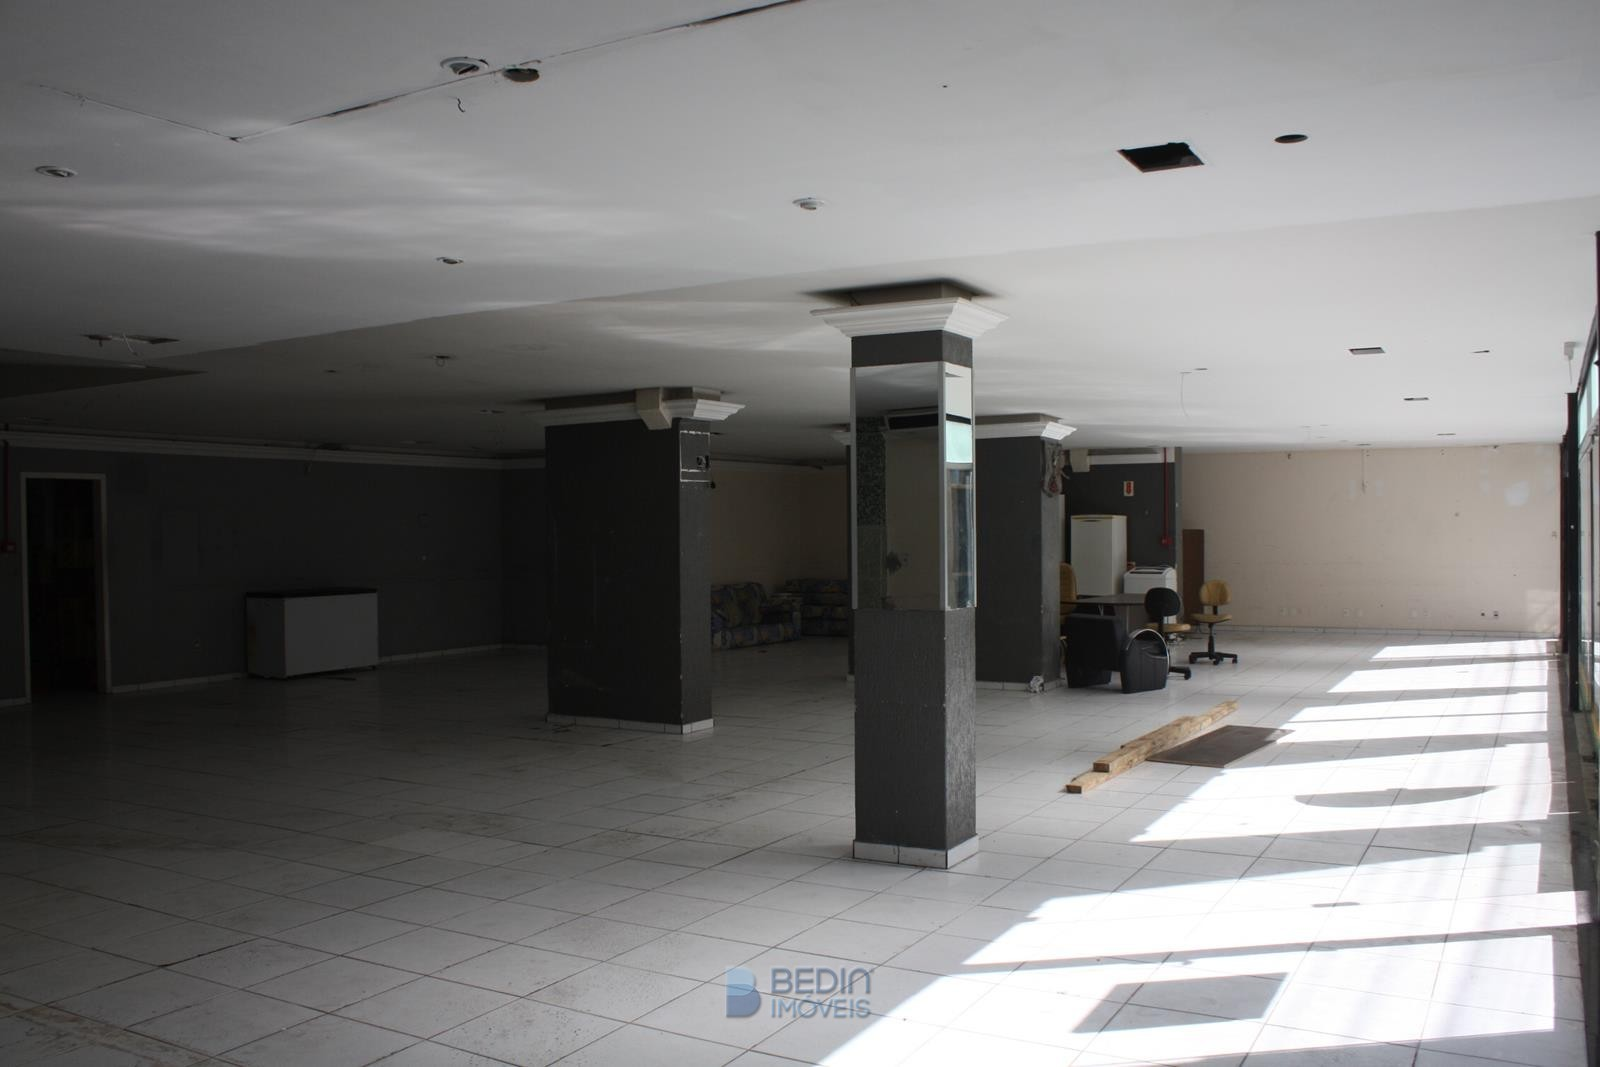 Sala aluguel comercial piso térreo